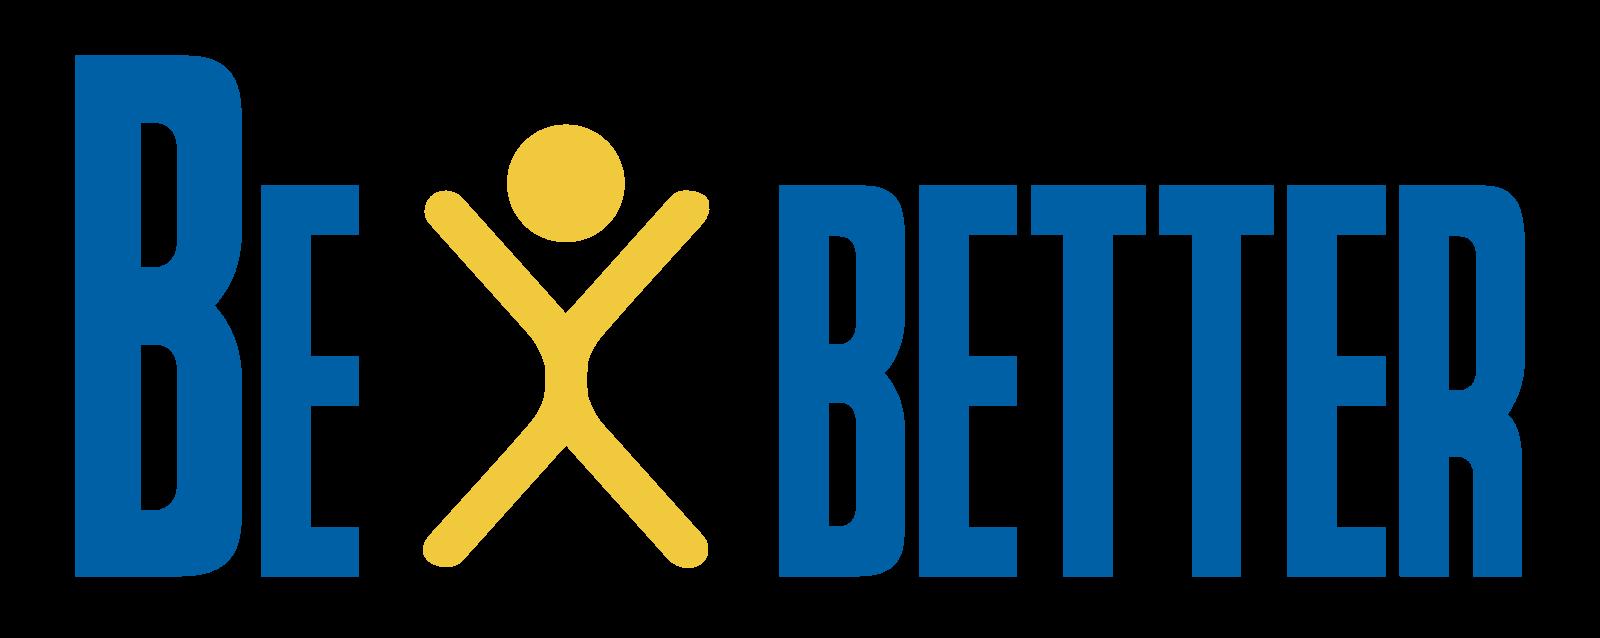 BeBetterMotywacja